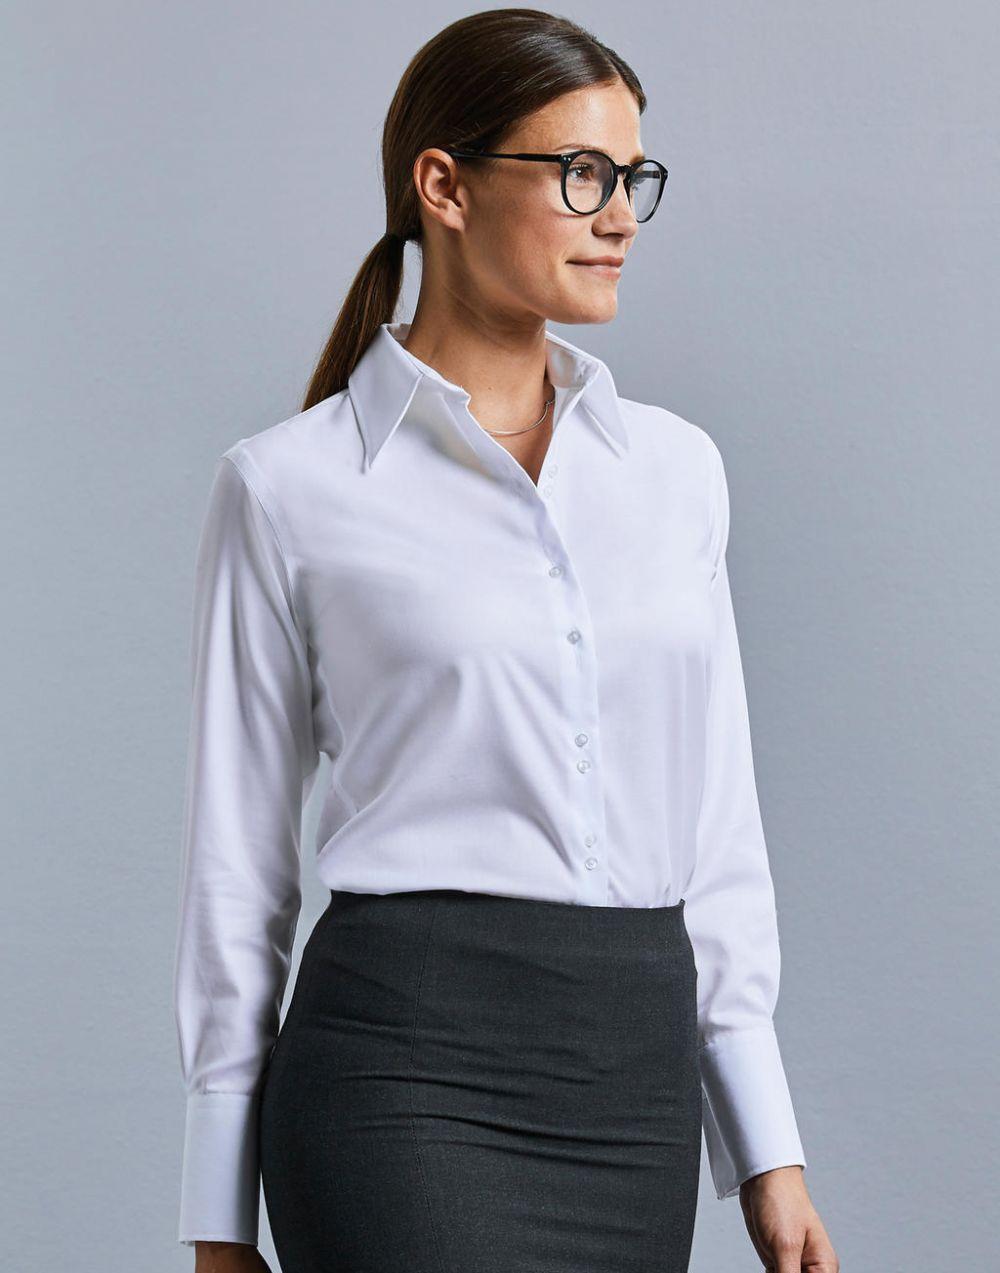 Camisas manga larga russell manga larga ultimate mujer para personalizar vista 1